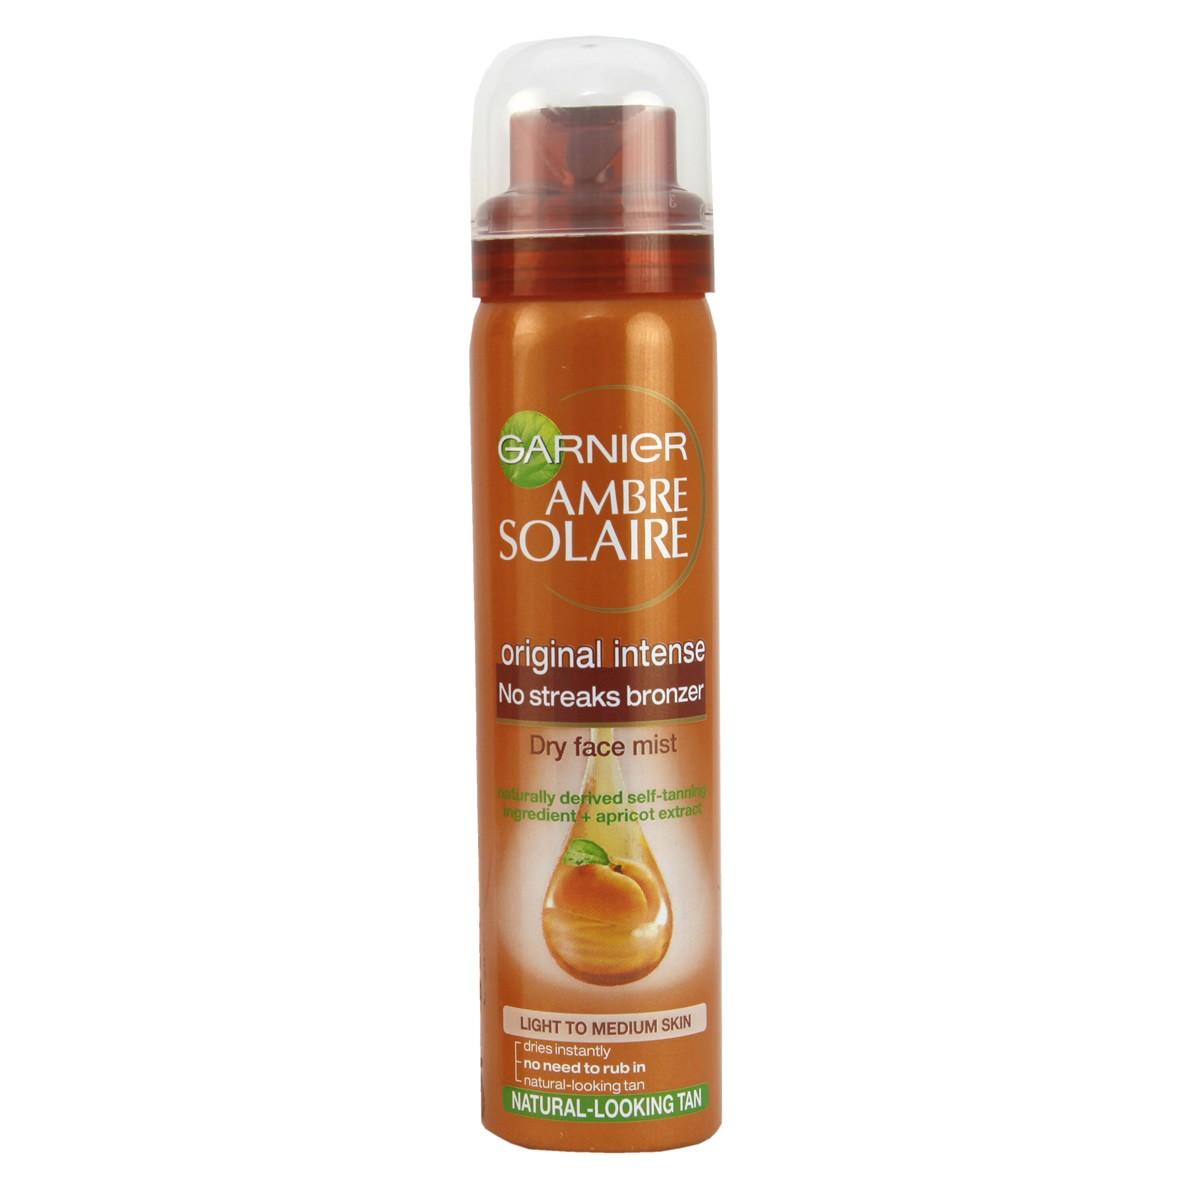 Garnier Ambre Solaire No Streaks Bronzer Face Mist (Original)